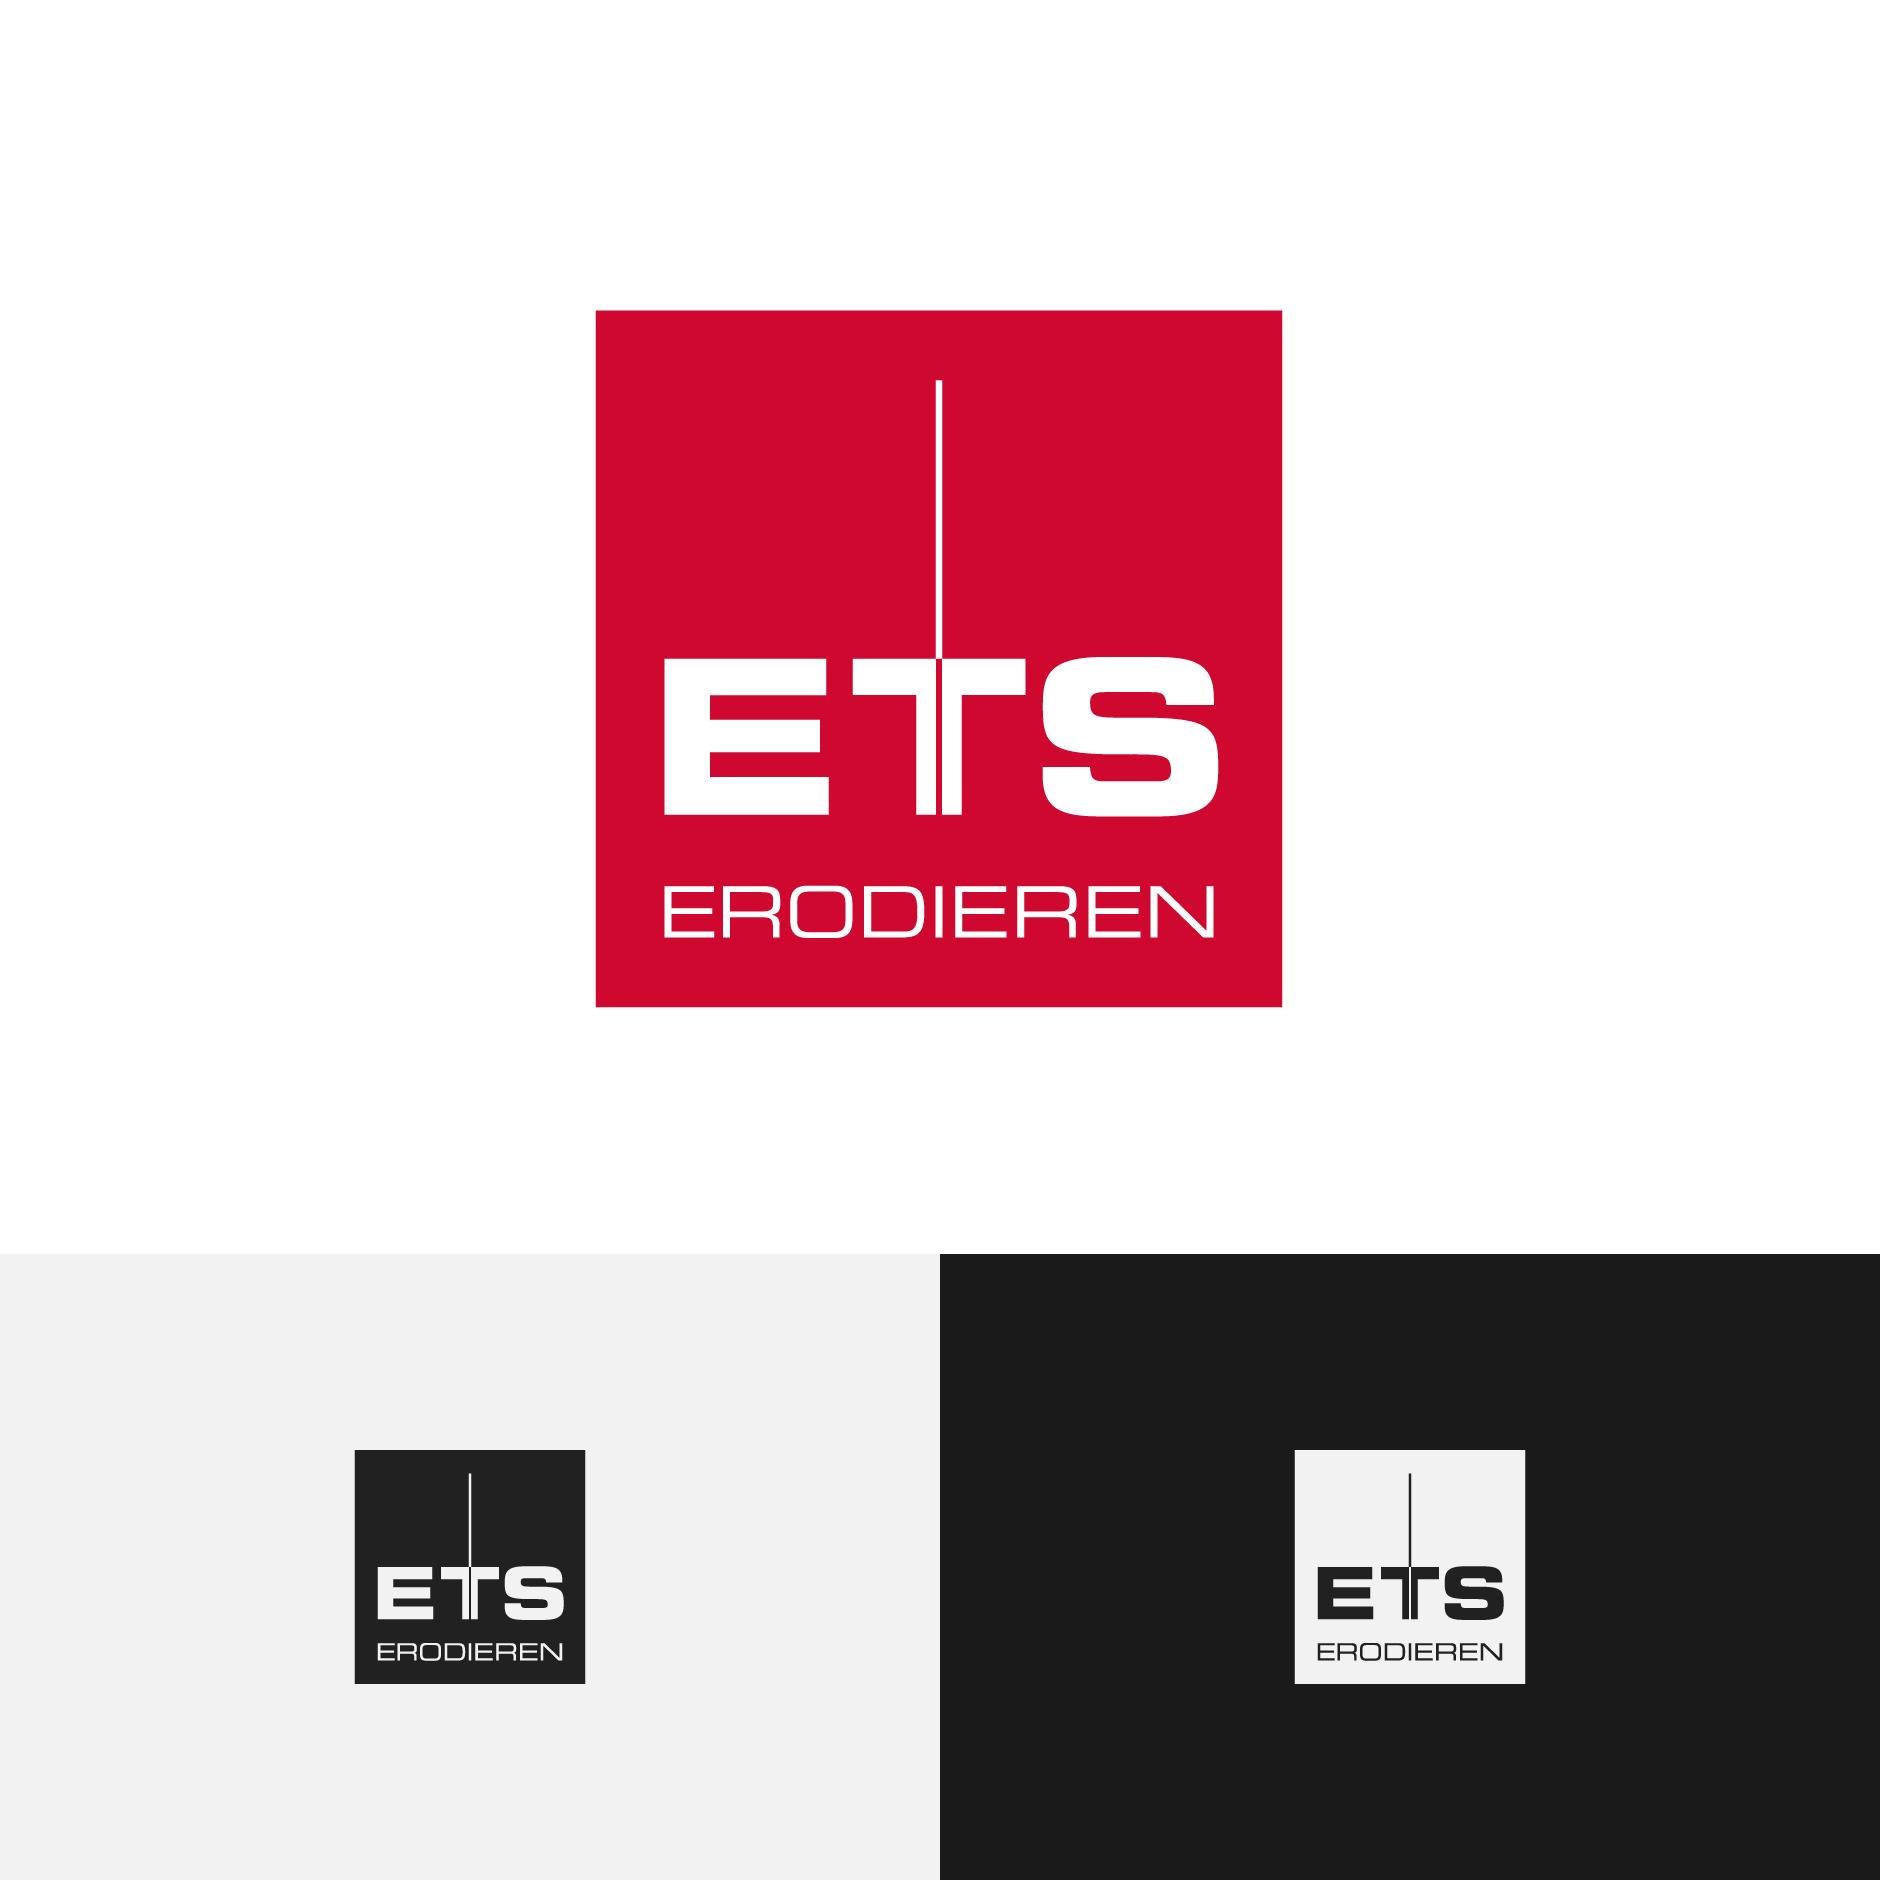 ets erodiertechnik logogestaltung-Logodesign ETS Erodiertechnik